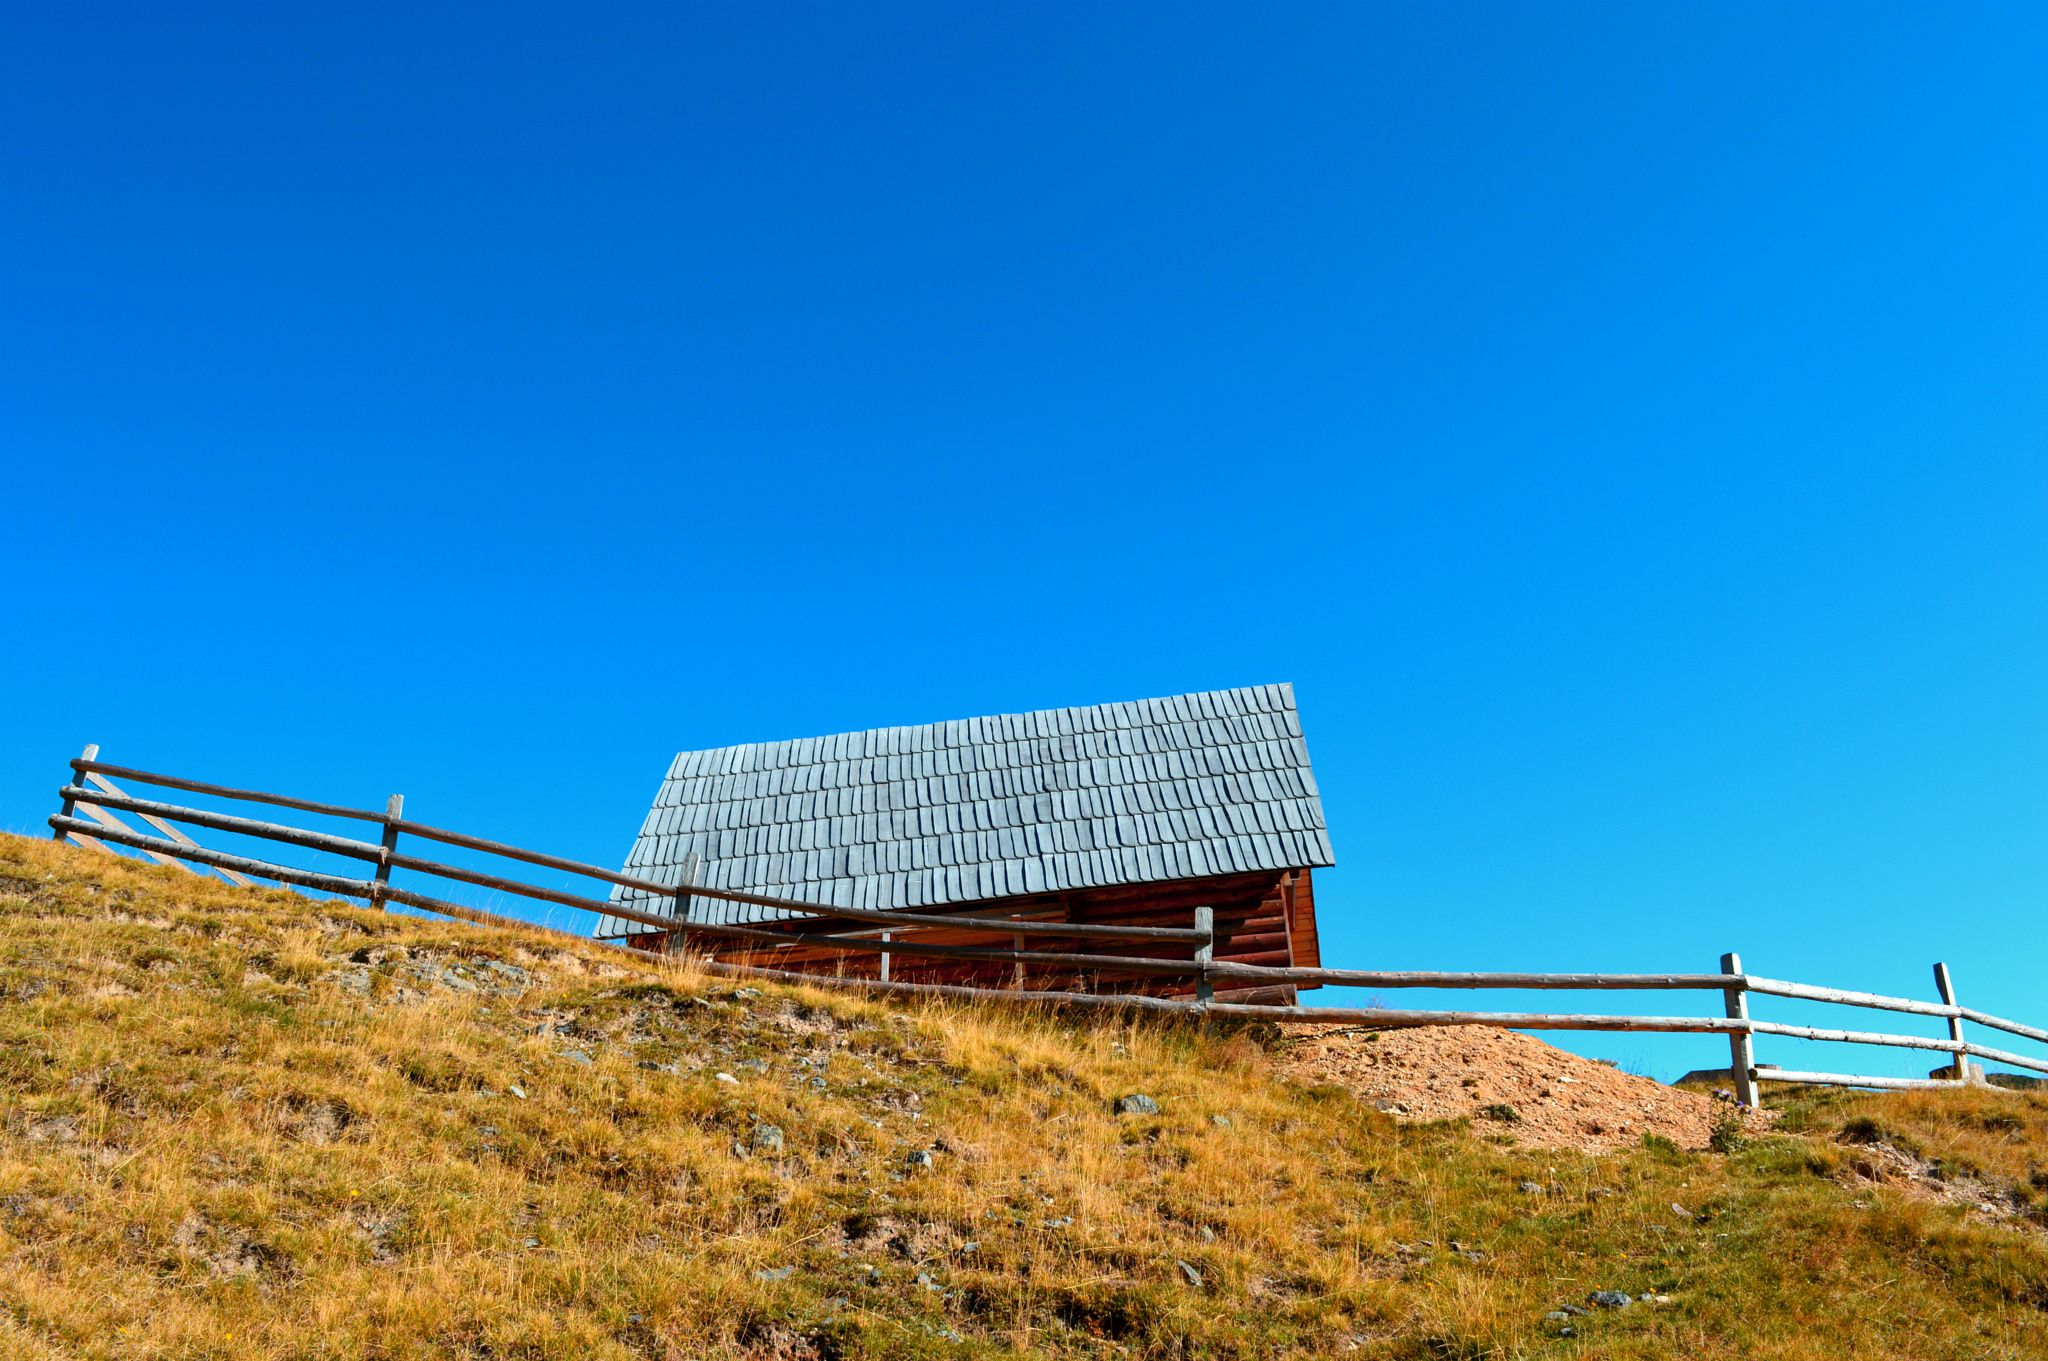 Small Cottage by AIDA DZAKULIC on 500px